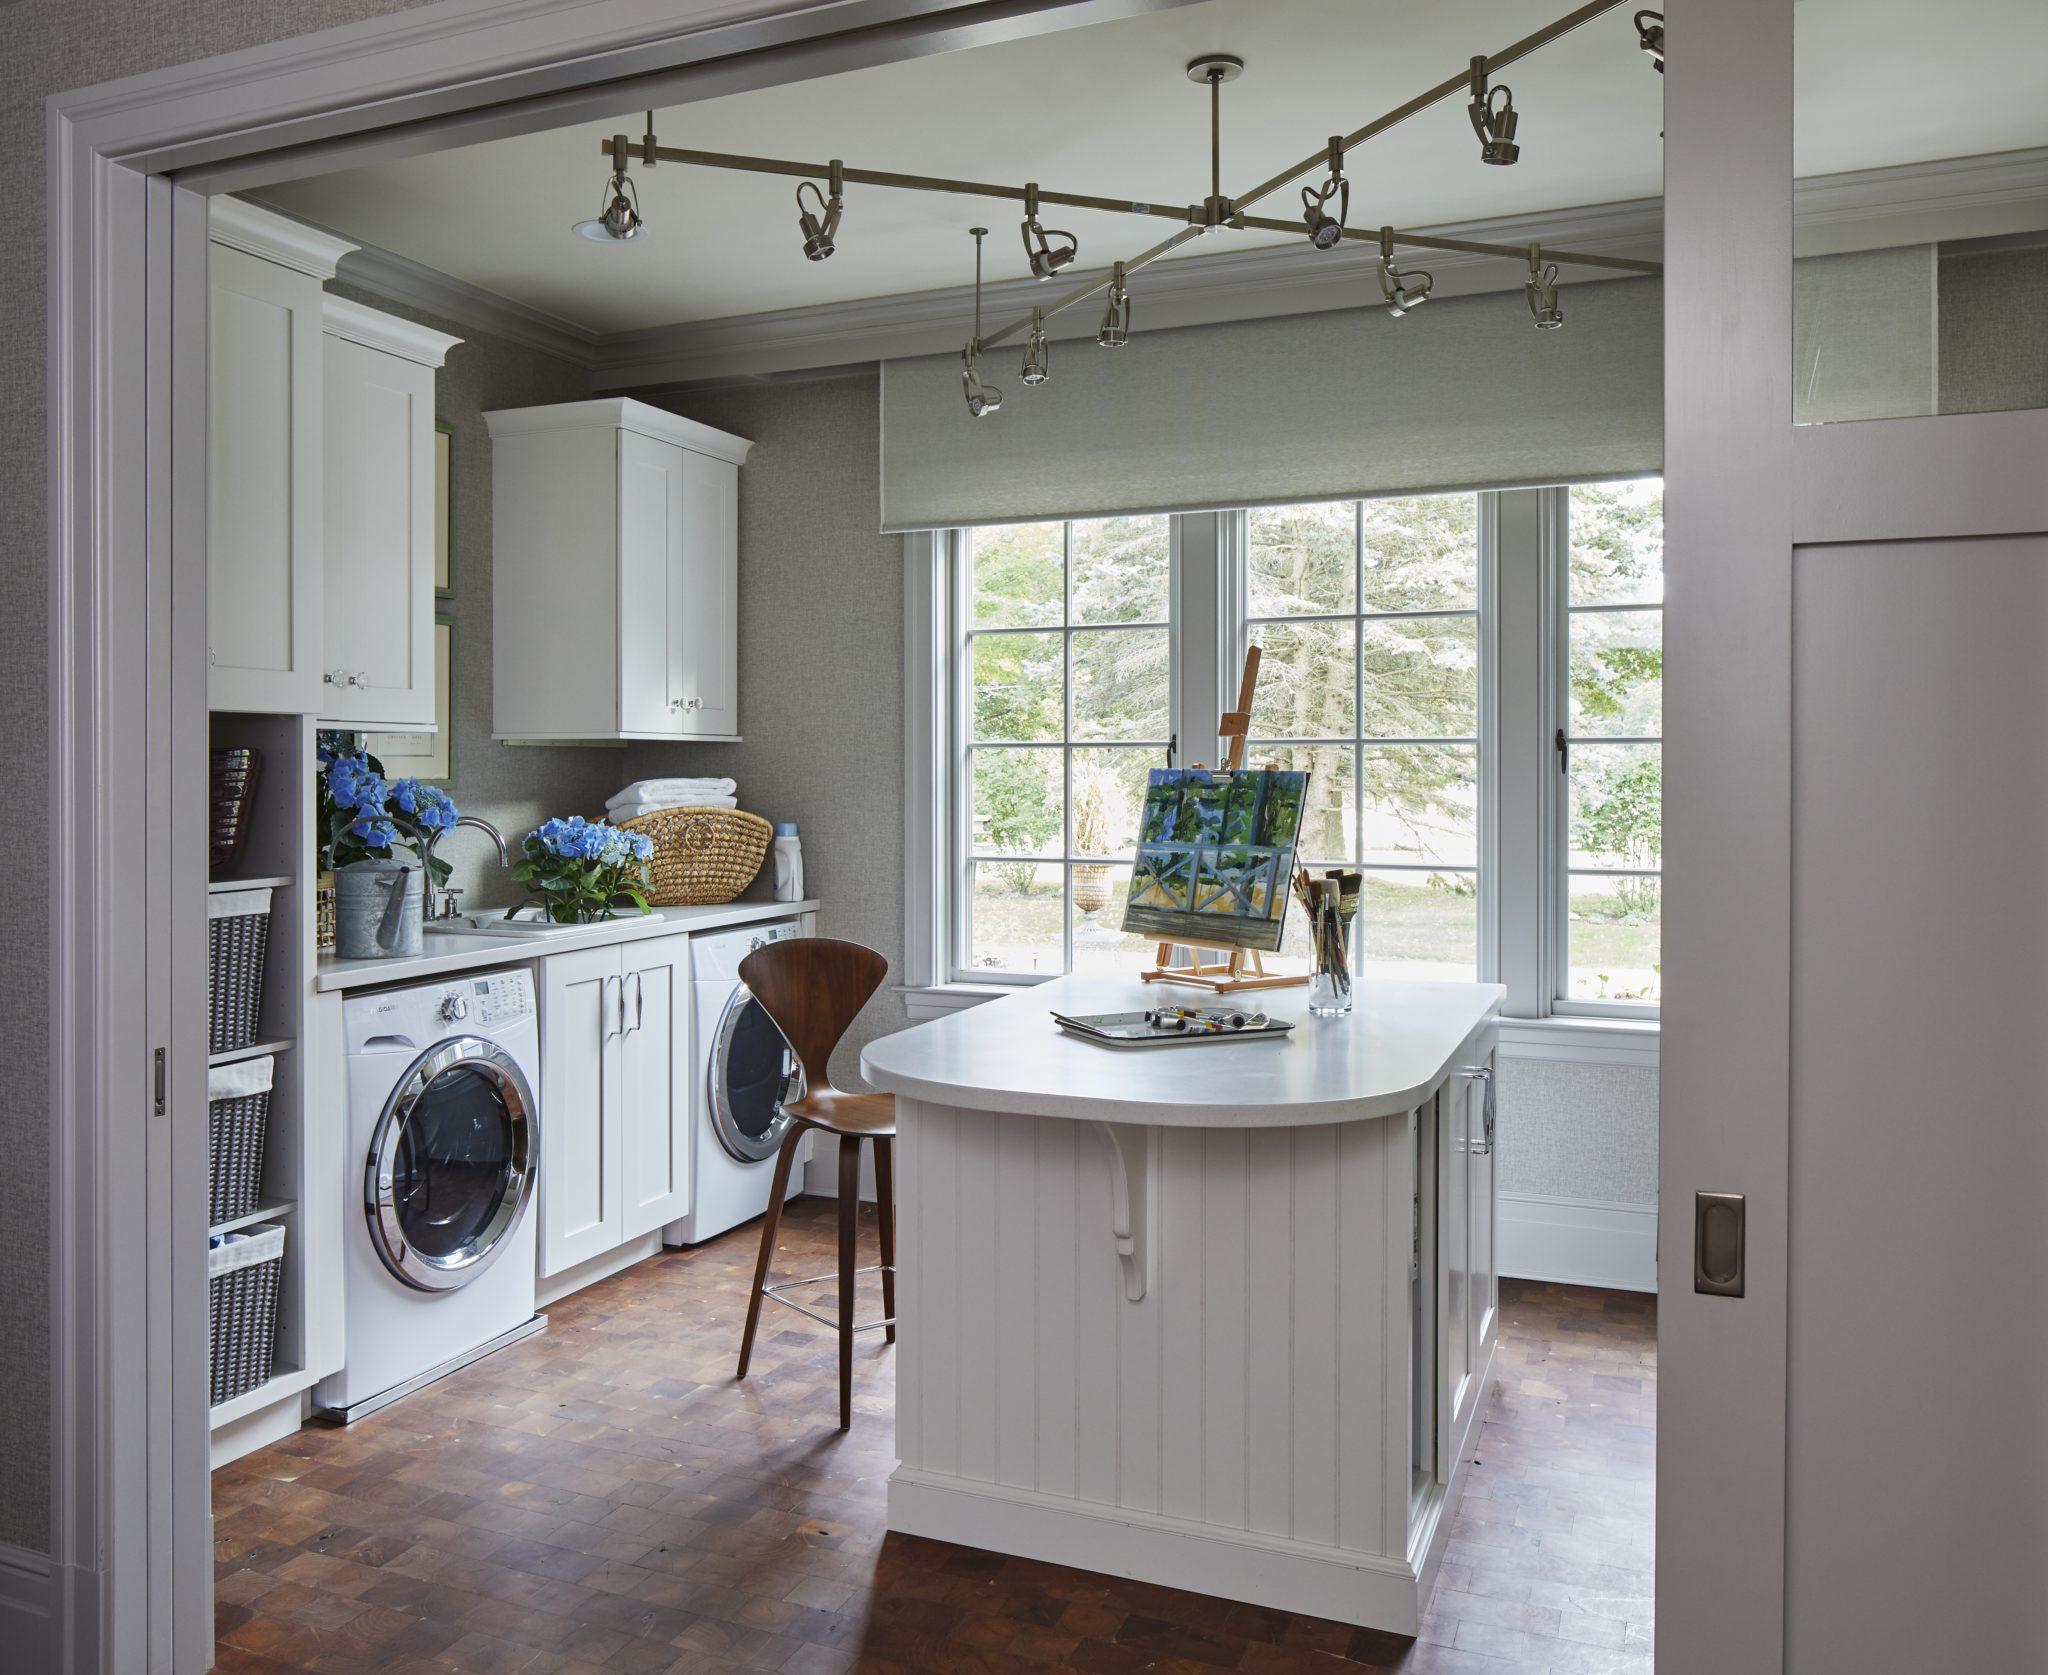 Wood and white Art & Laundry Studio, walnut Cherner stool, waxed mesquite floor by Elizabeth Drake